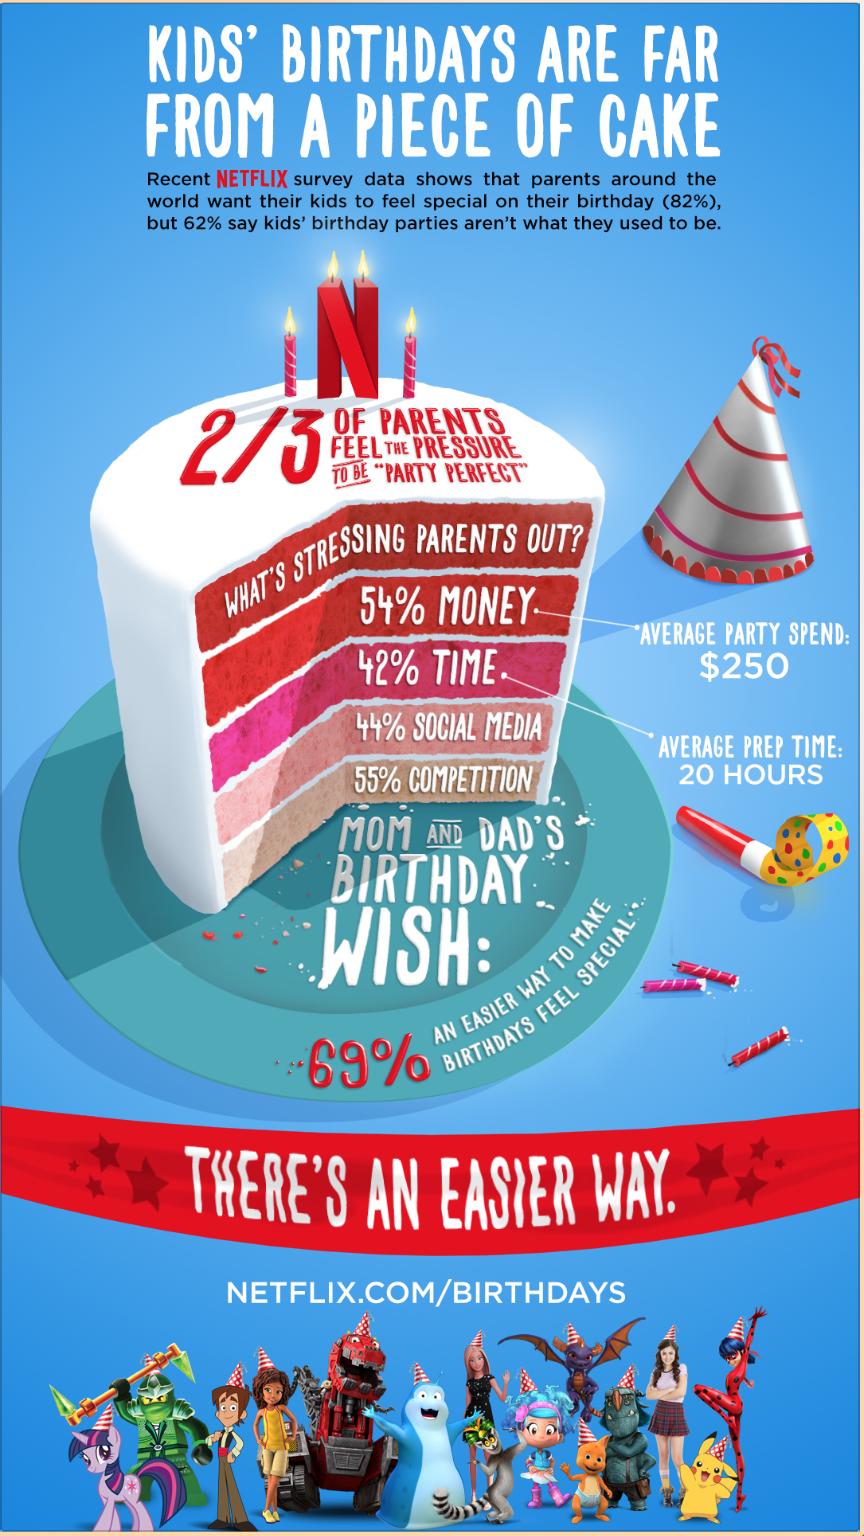 BirthdayCakeFinal.jpg